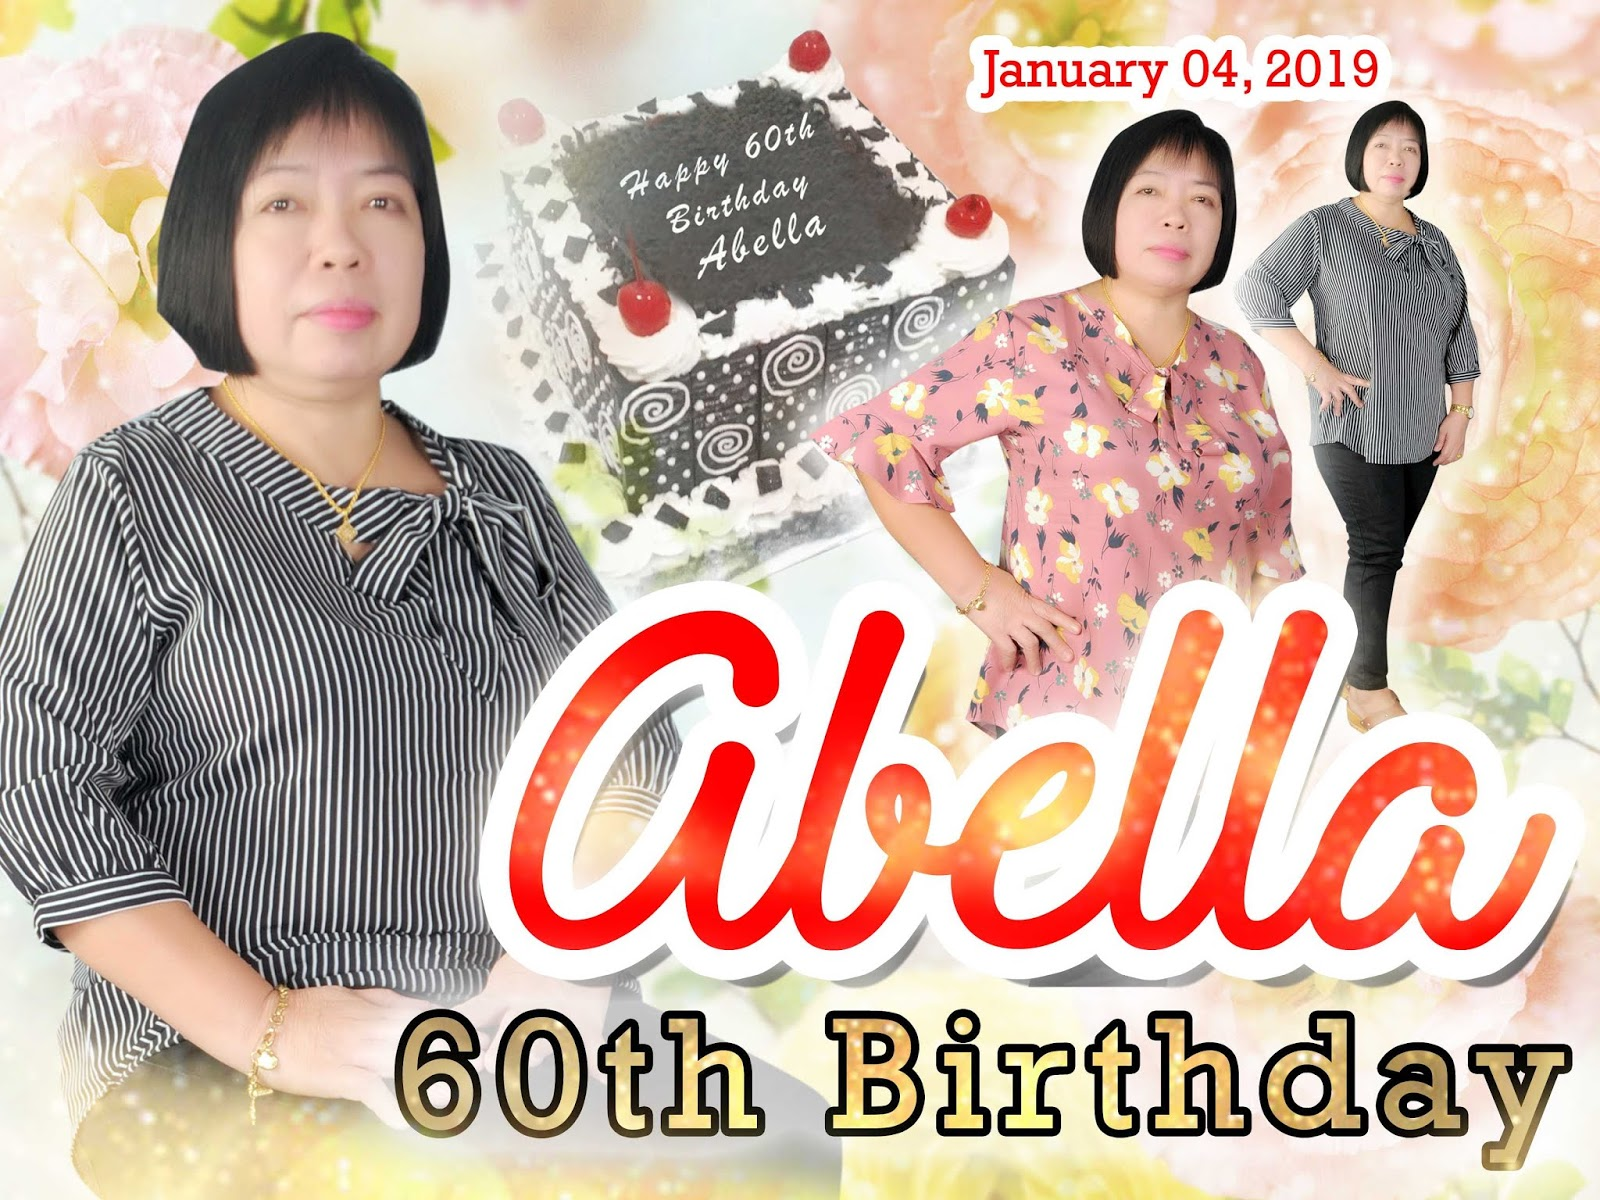 60th Birthday Abella Tarpaulin Layout Free Download